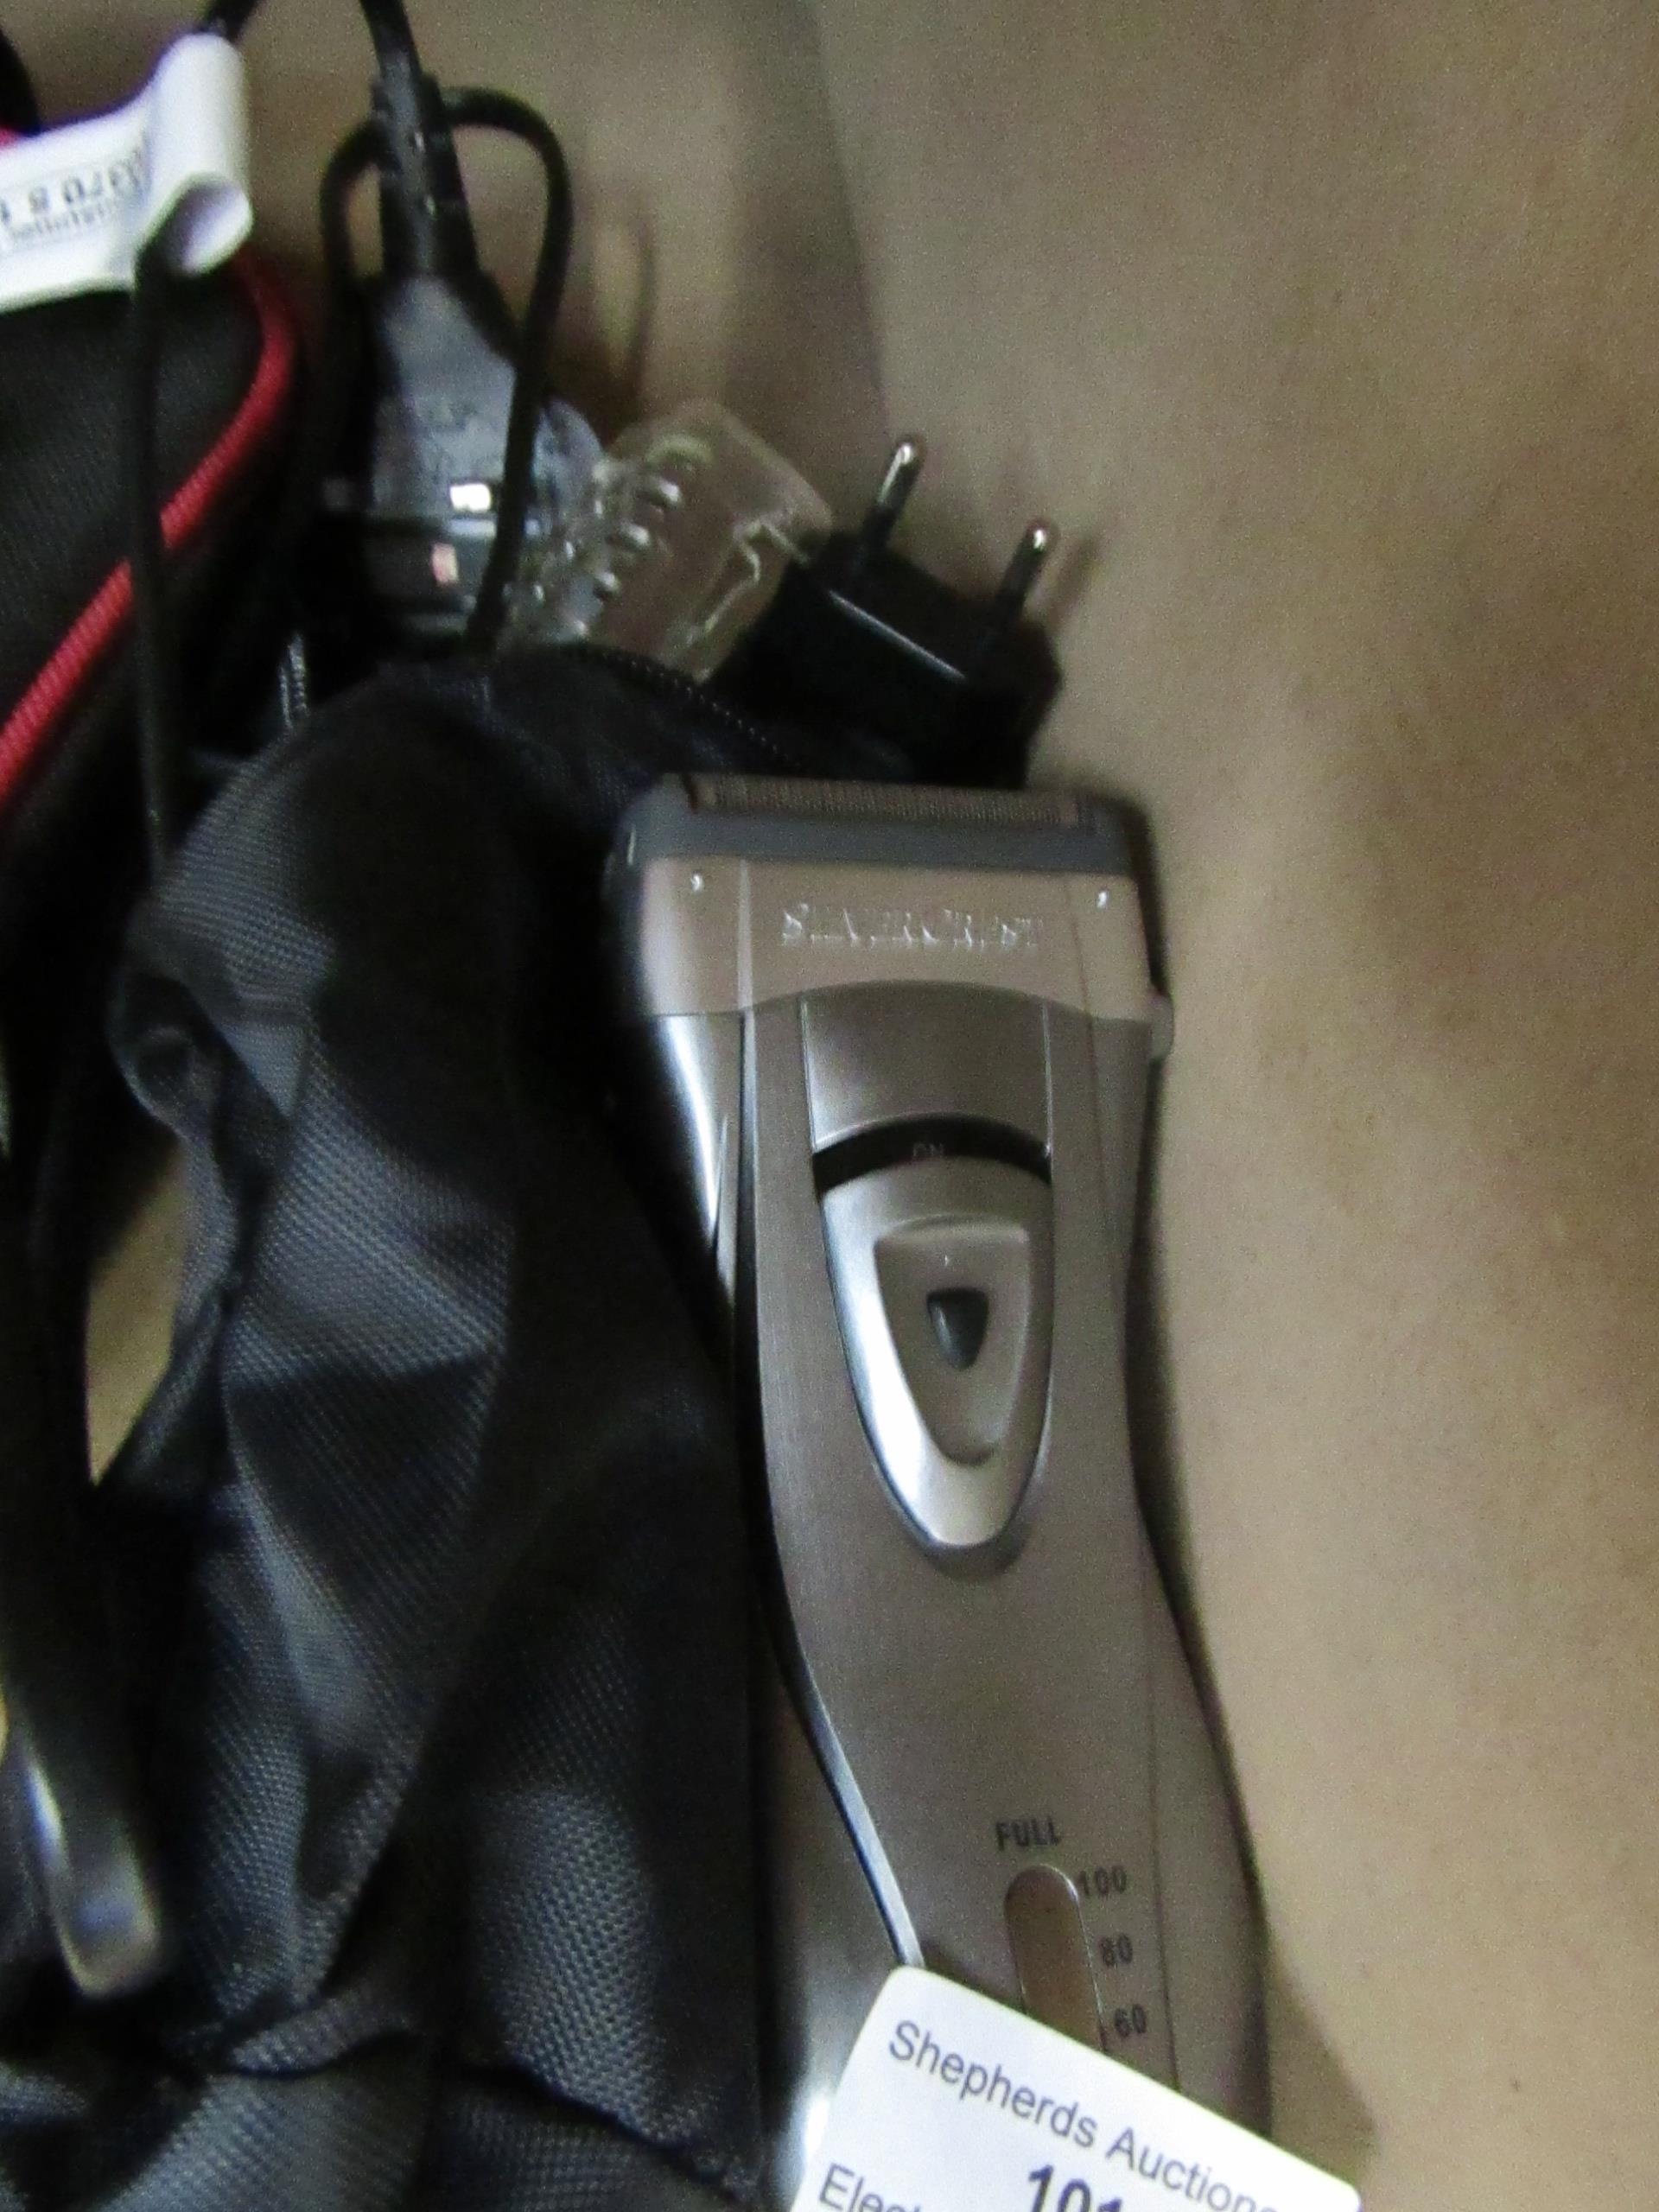 Lot 101 - Silver Crest men's beard trimmer, untested.